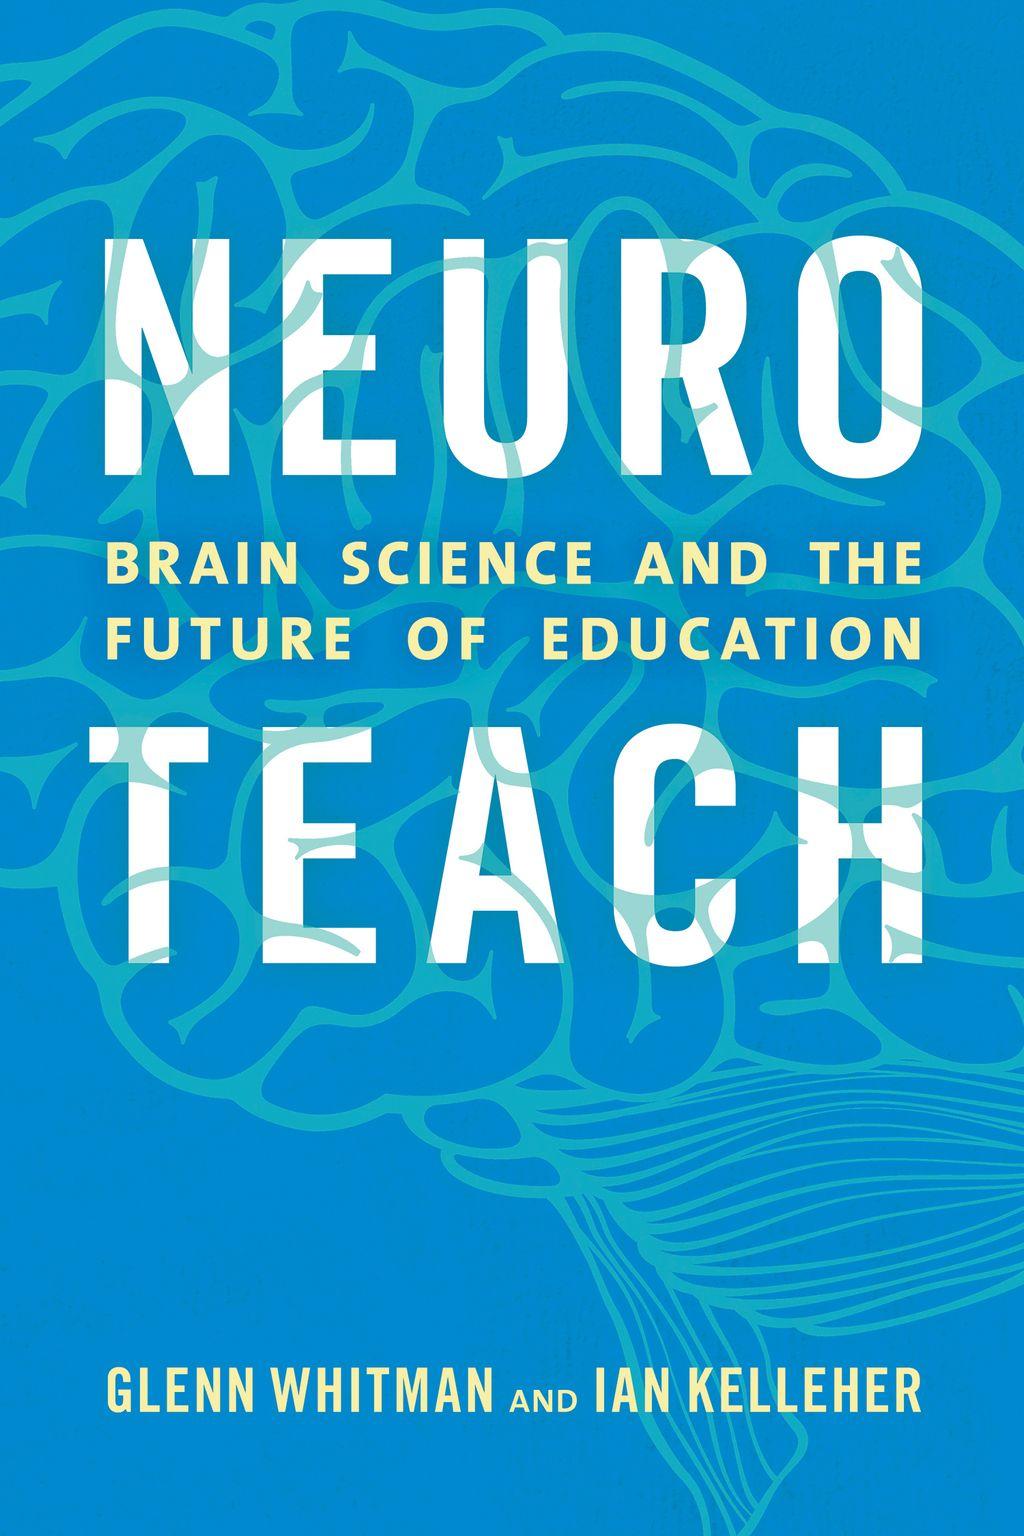 Neuroteach Ebook Brain Science Science Brain Based Learning